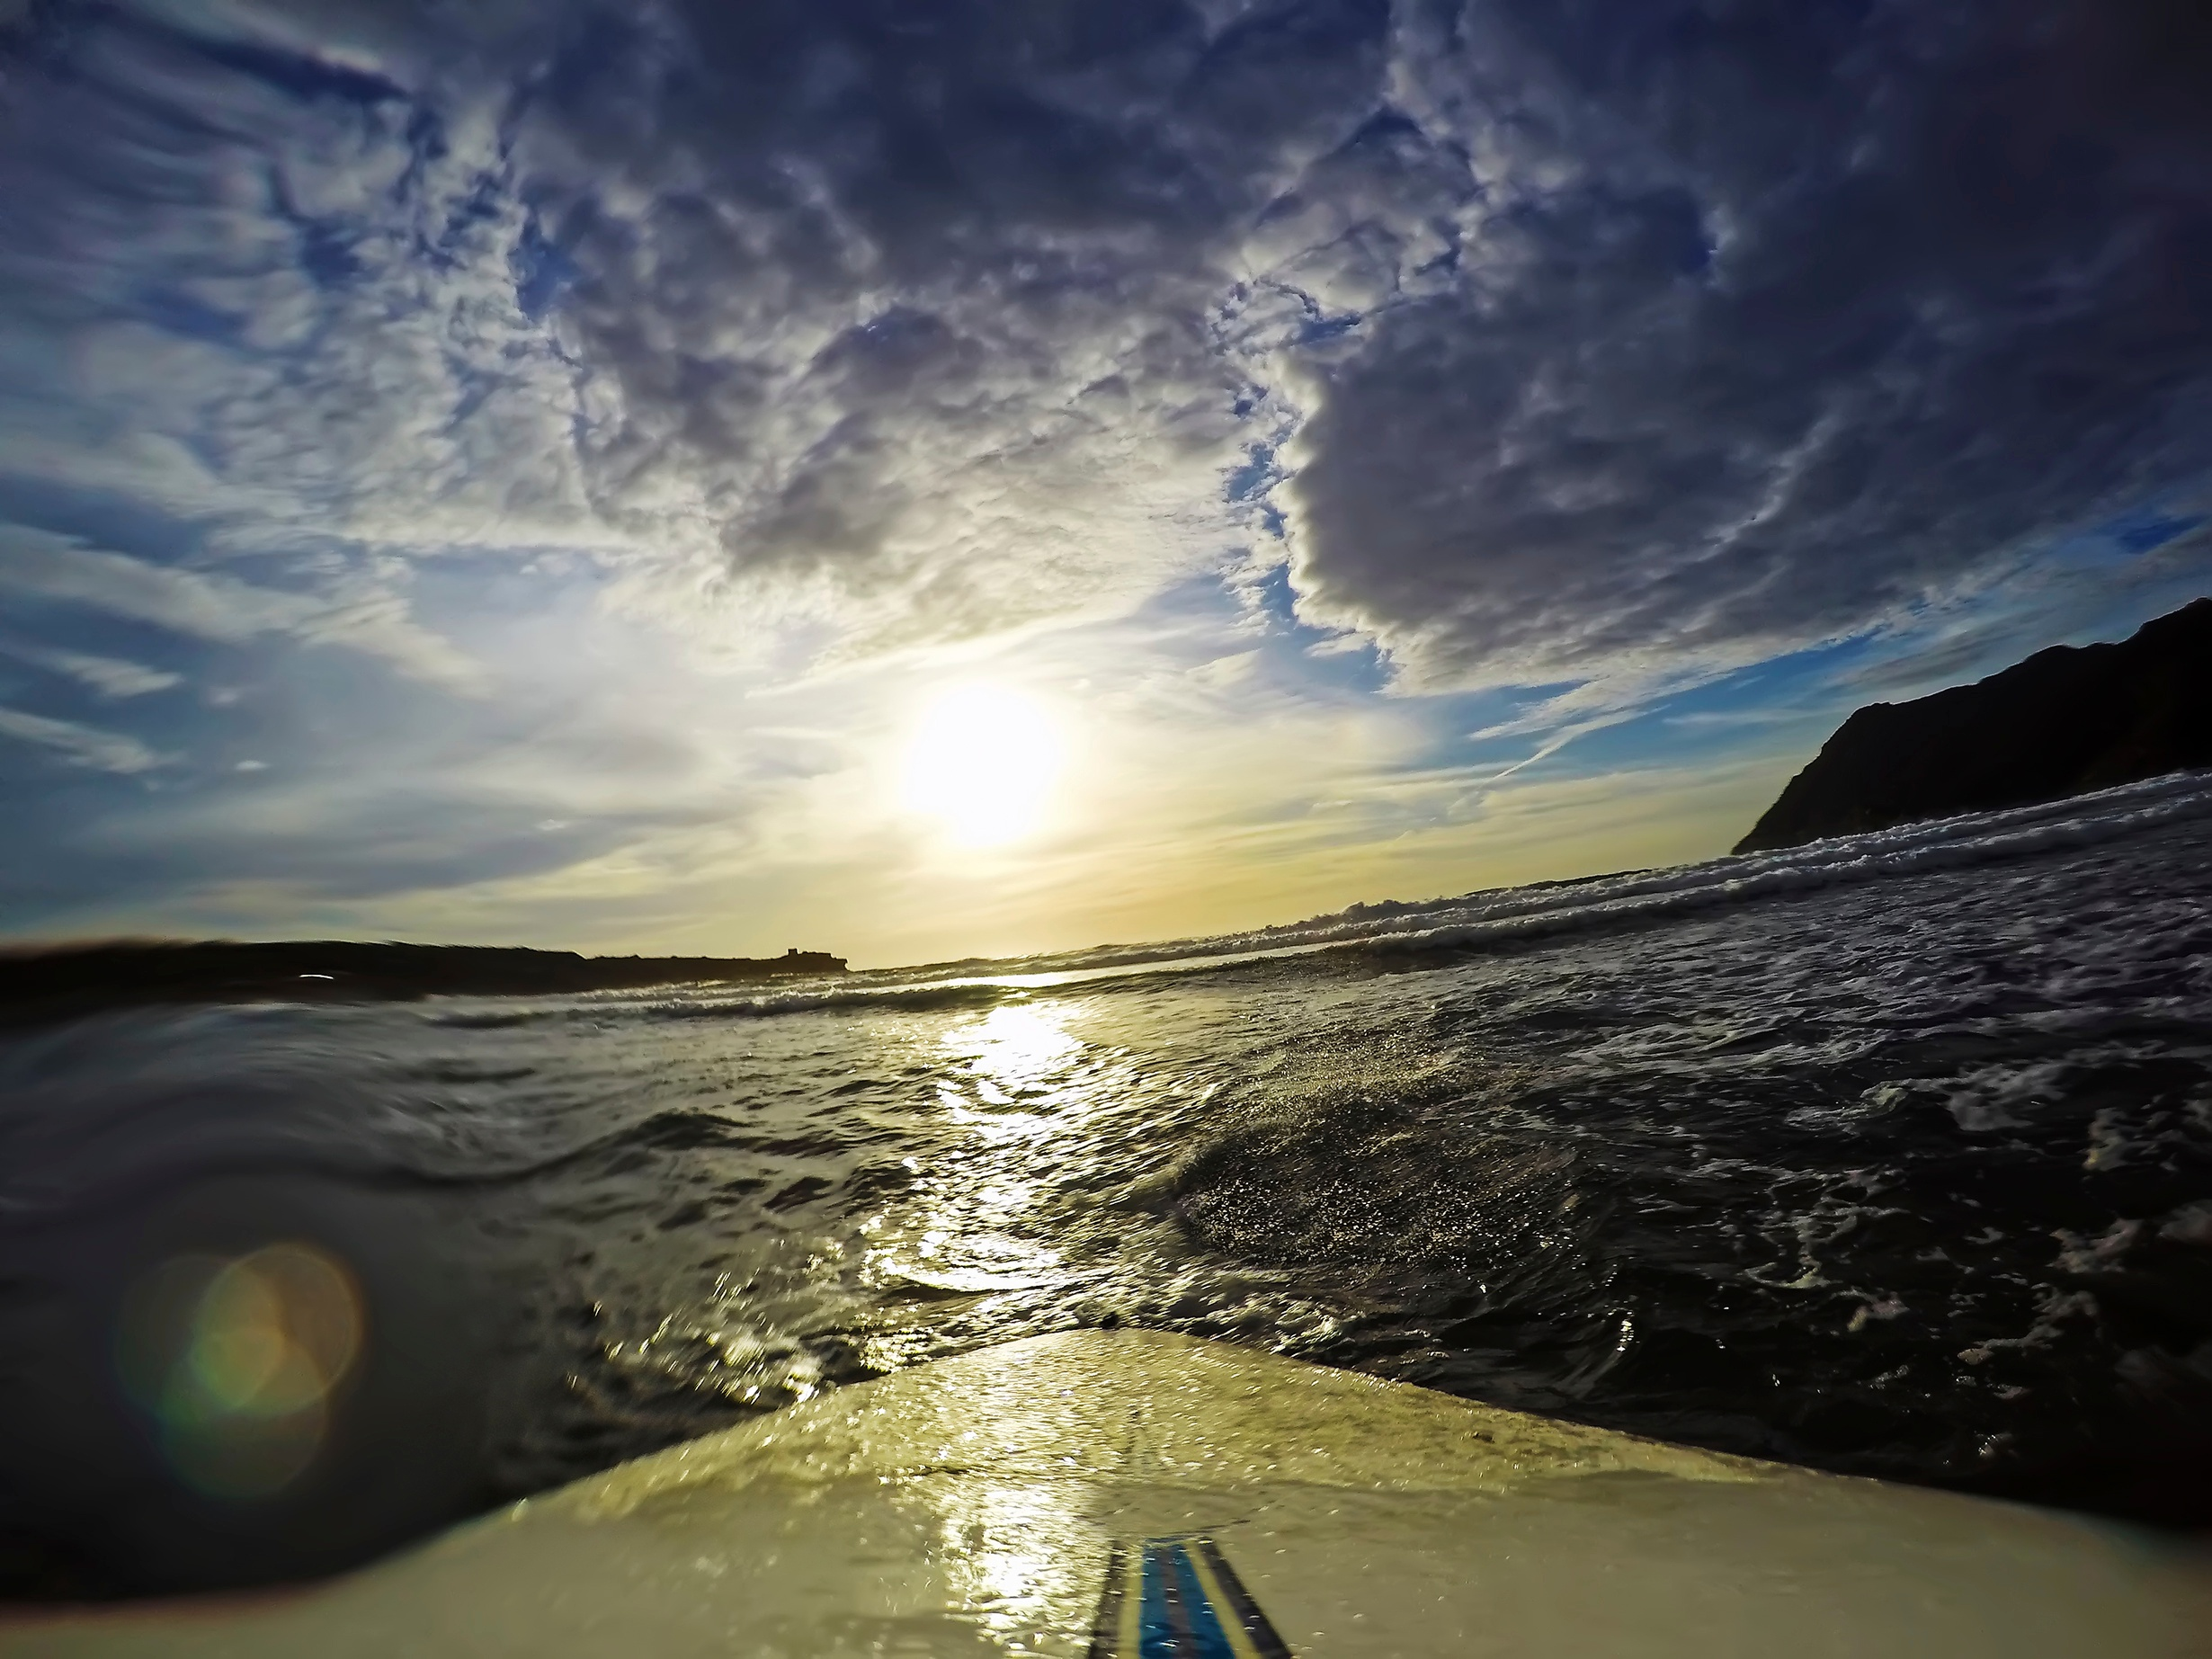 Surfboard-1